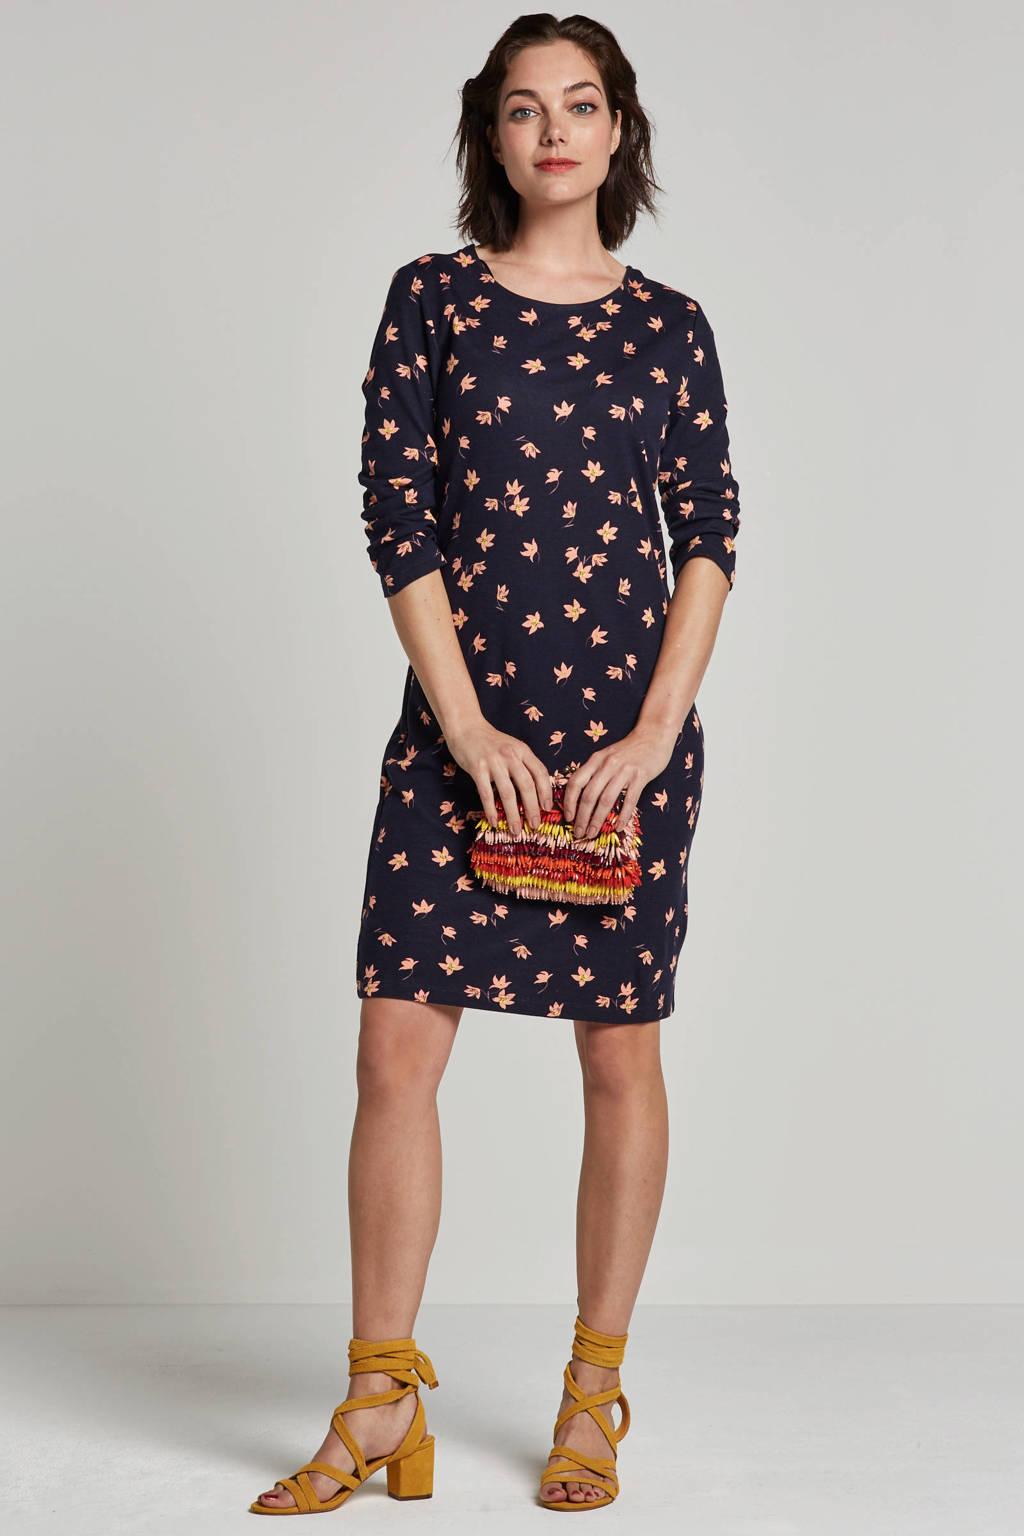 Saint Tropez jurk met bloemenprint, Blauw